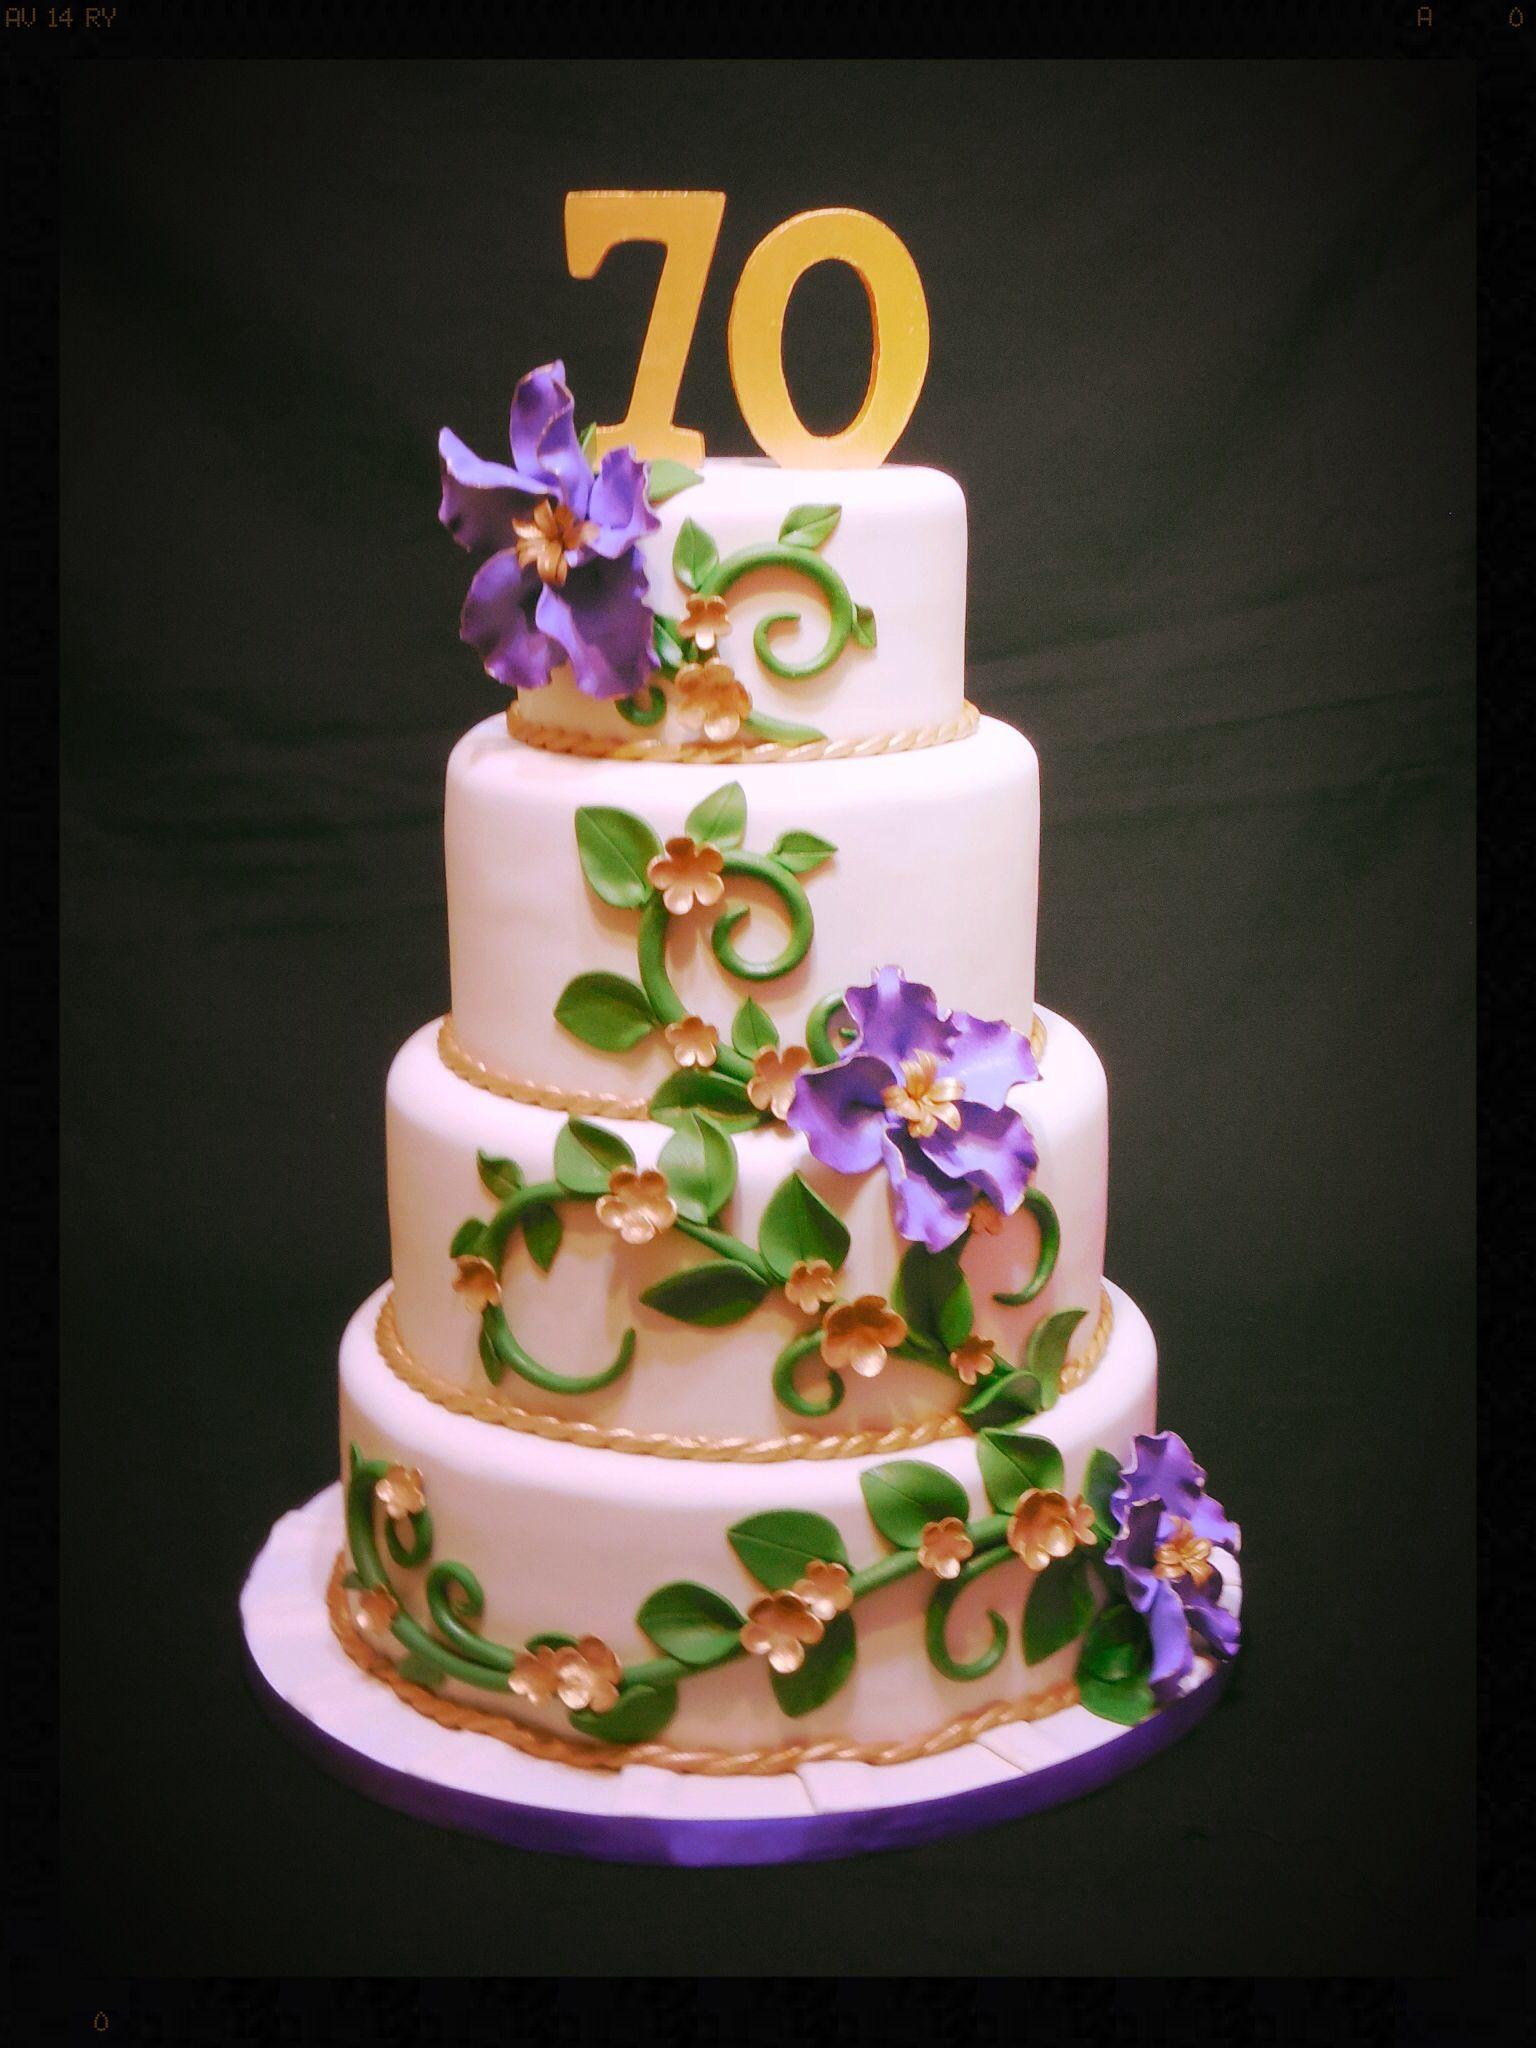 70th Birthday Cake My Cakes Pinterest 70th Birthday Cake 70